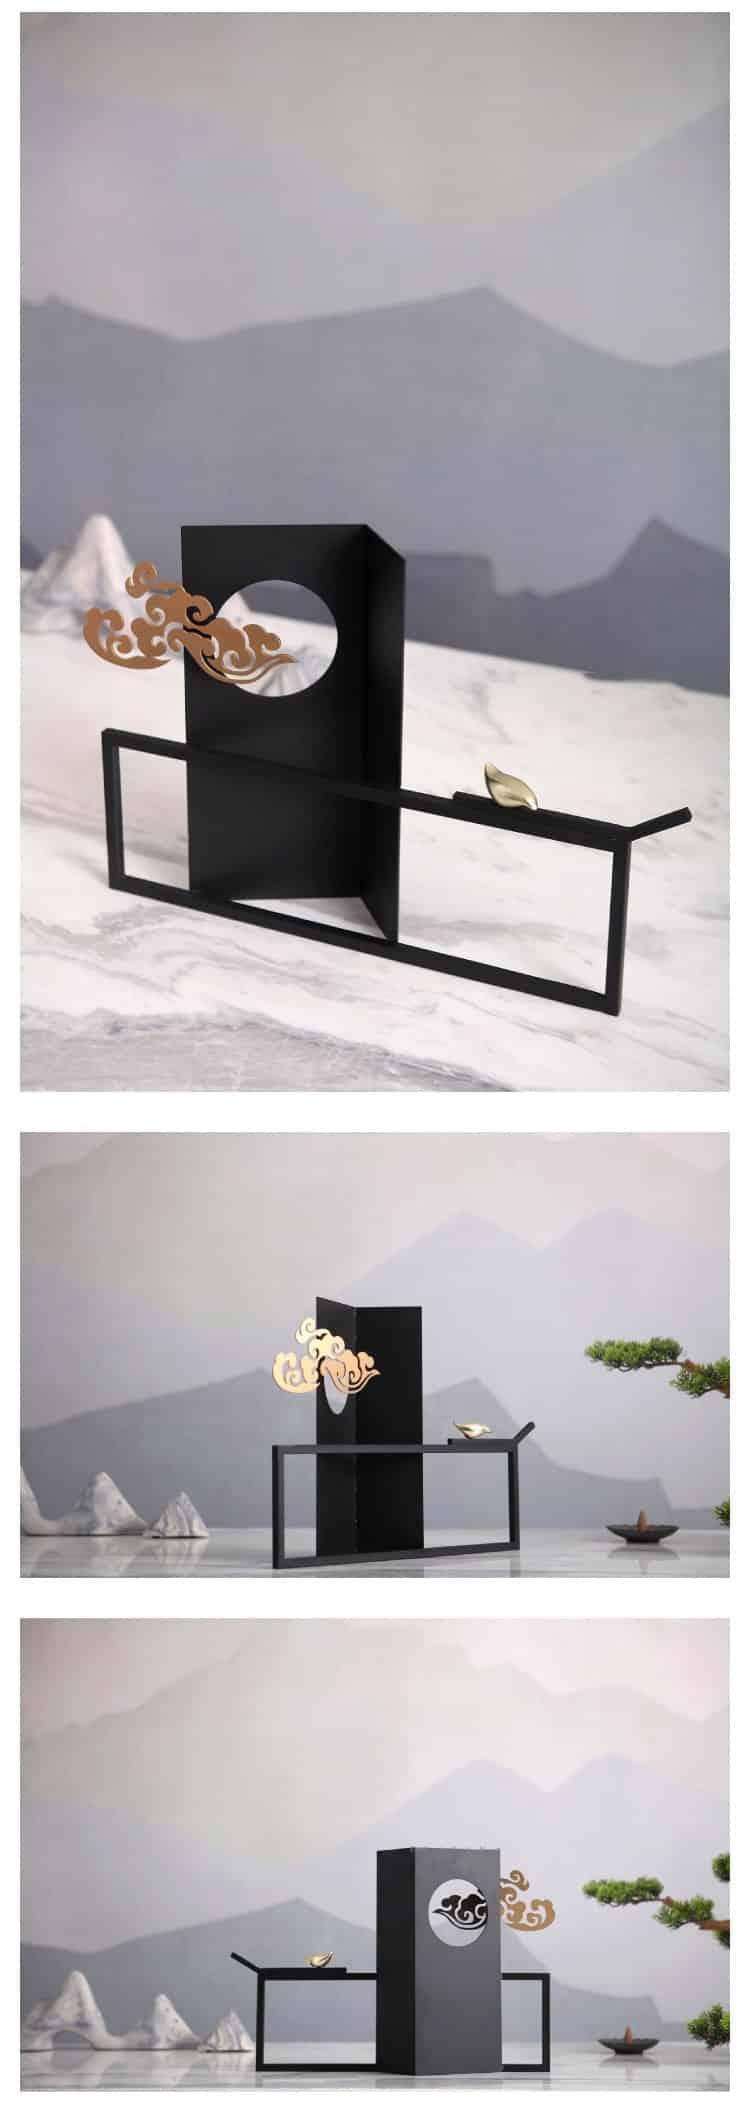 New Chinese Auspicious Cloud Round Window Wrought Iron Handicraft Ornaments Modern Home Crafts Office Desktop Decor Accessories